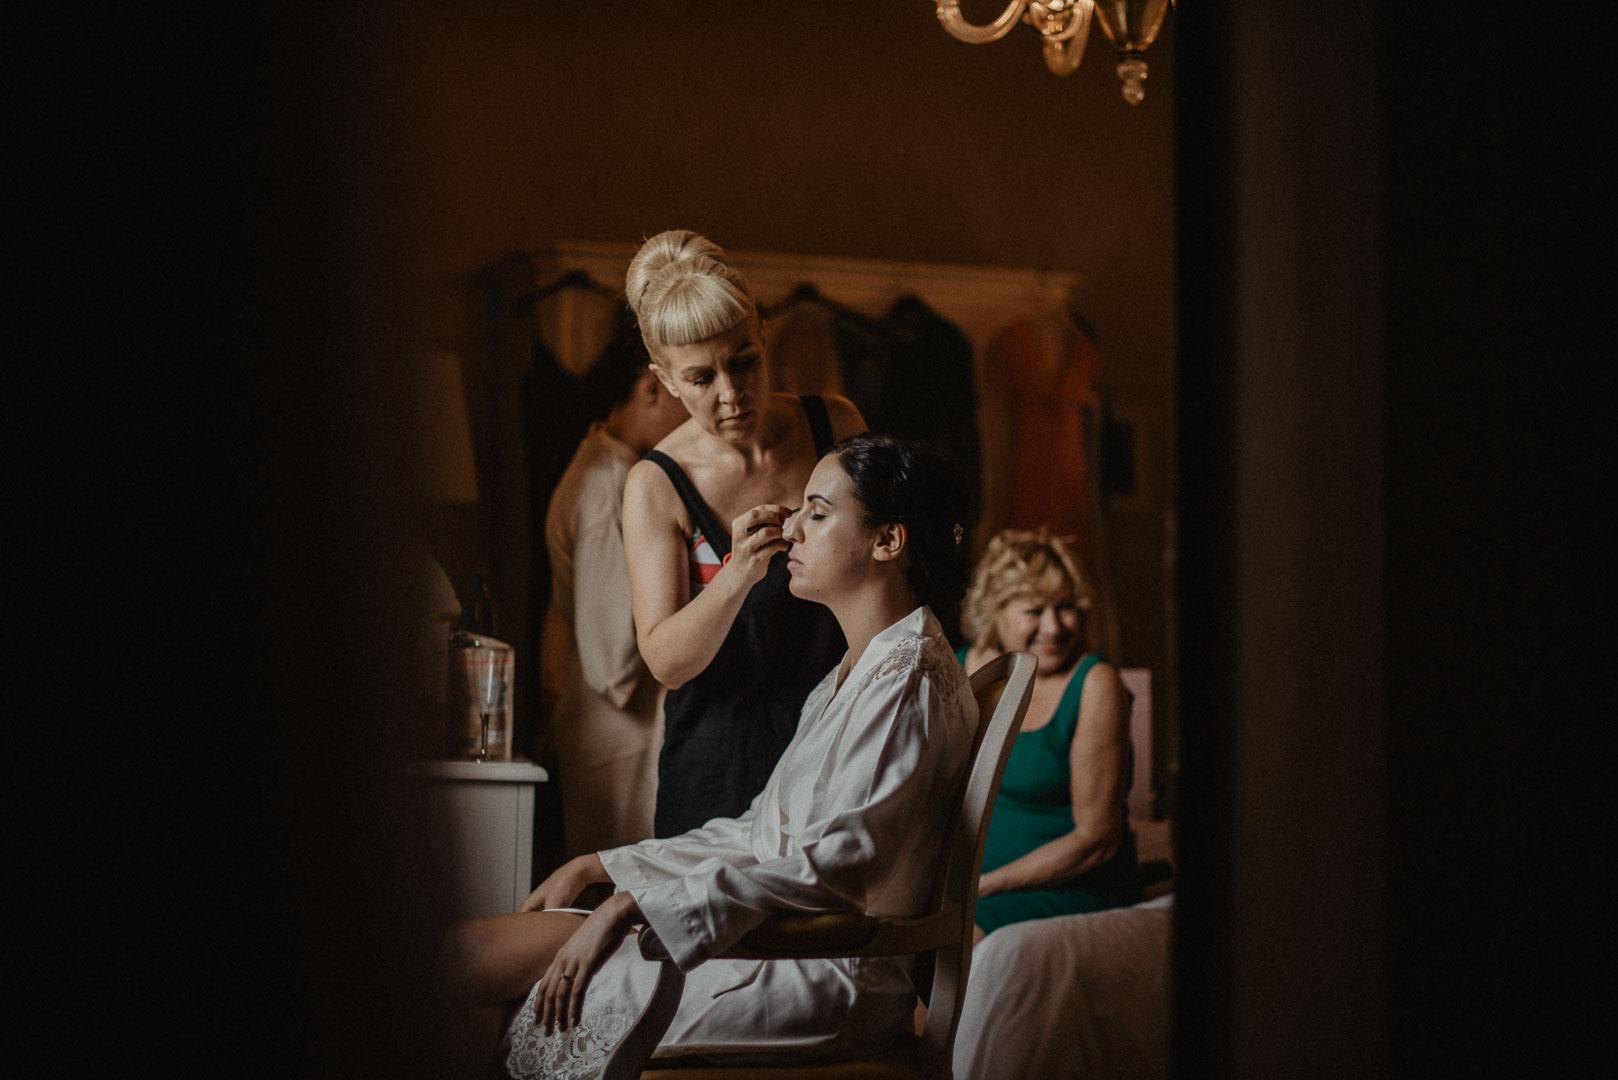 wedding-photographer-destination-fineart-bespoke-reportage-tuscany-villascorzi-vivianeizzo-spazio46-30